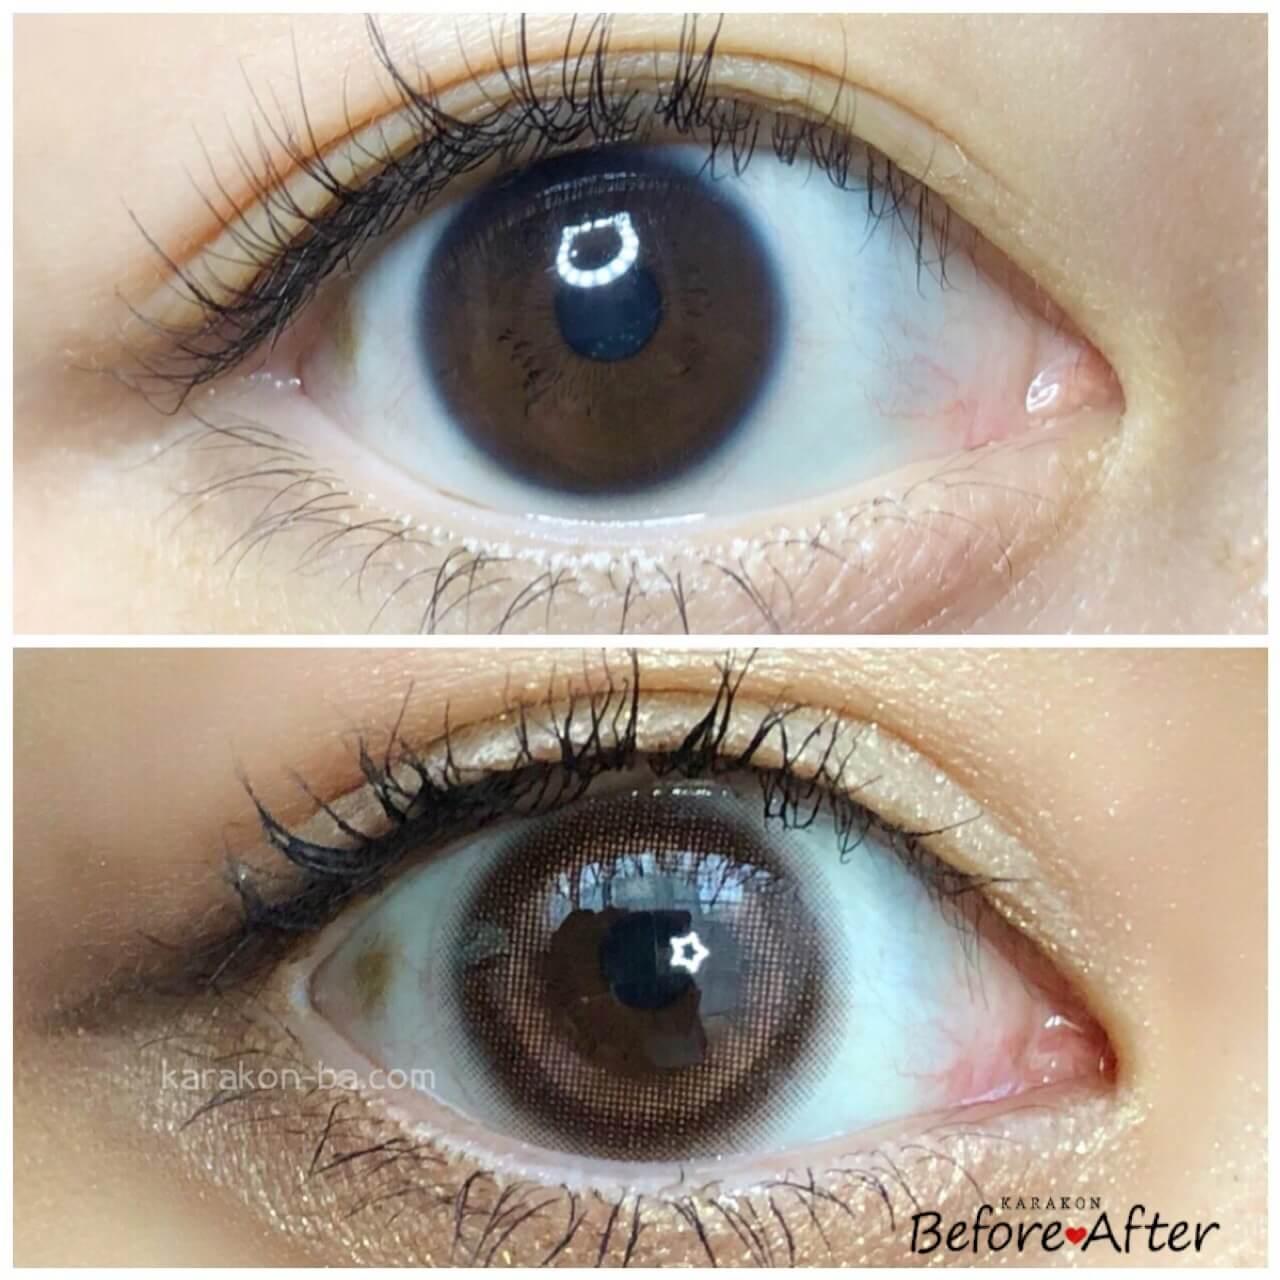 eyemake(アイメイク)シアーブラウンのカラコン装着画像/裸眼と比較レポ